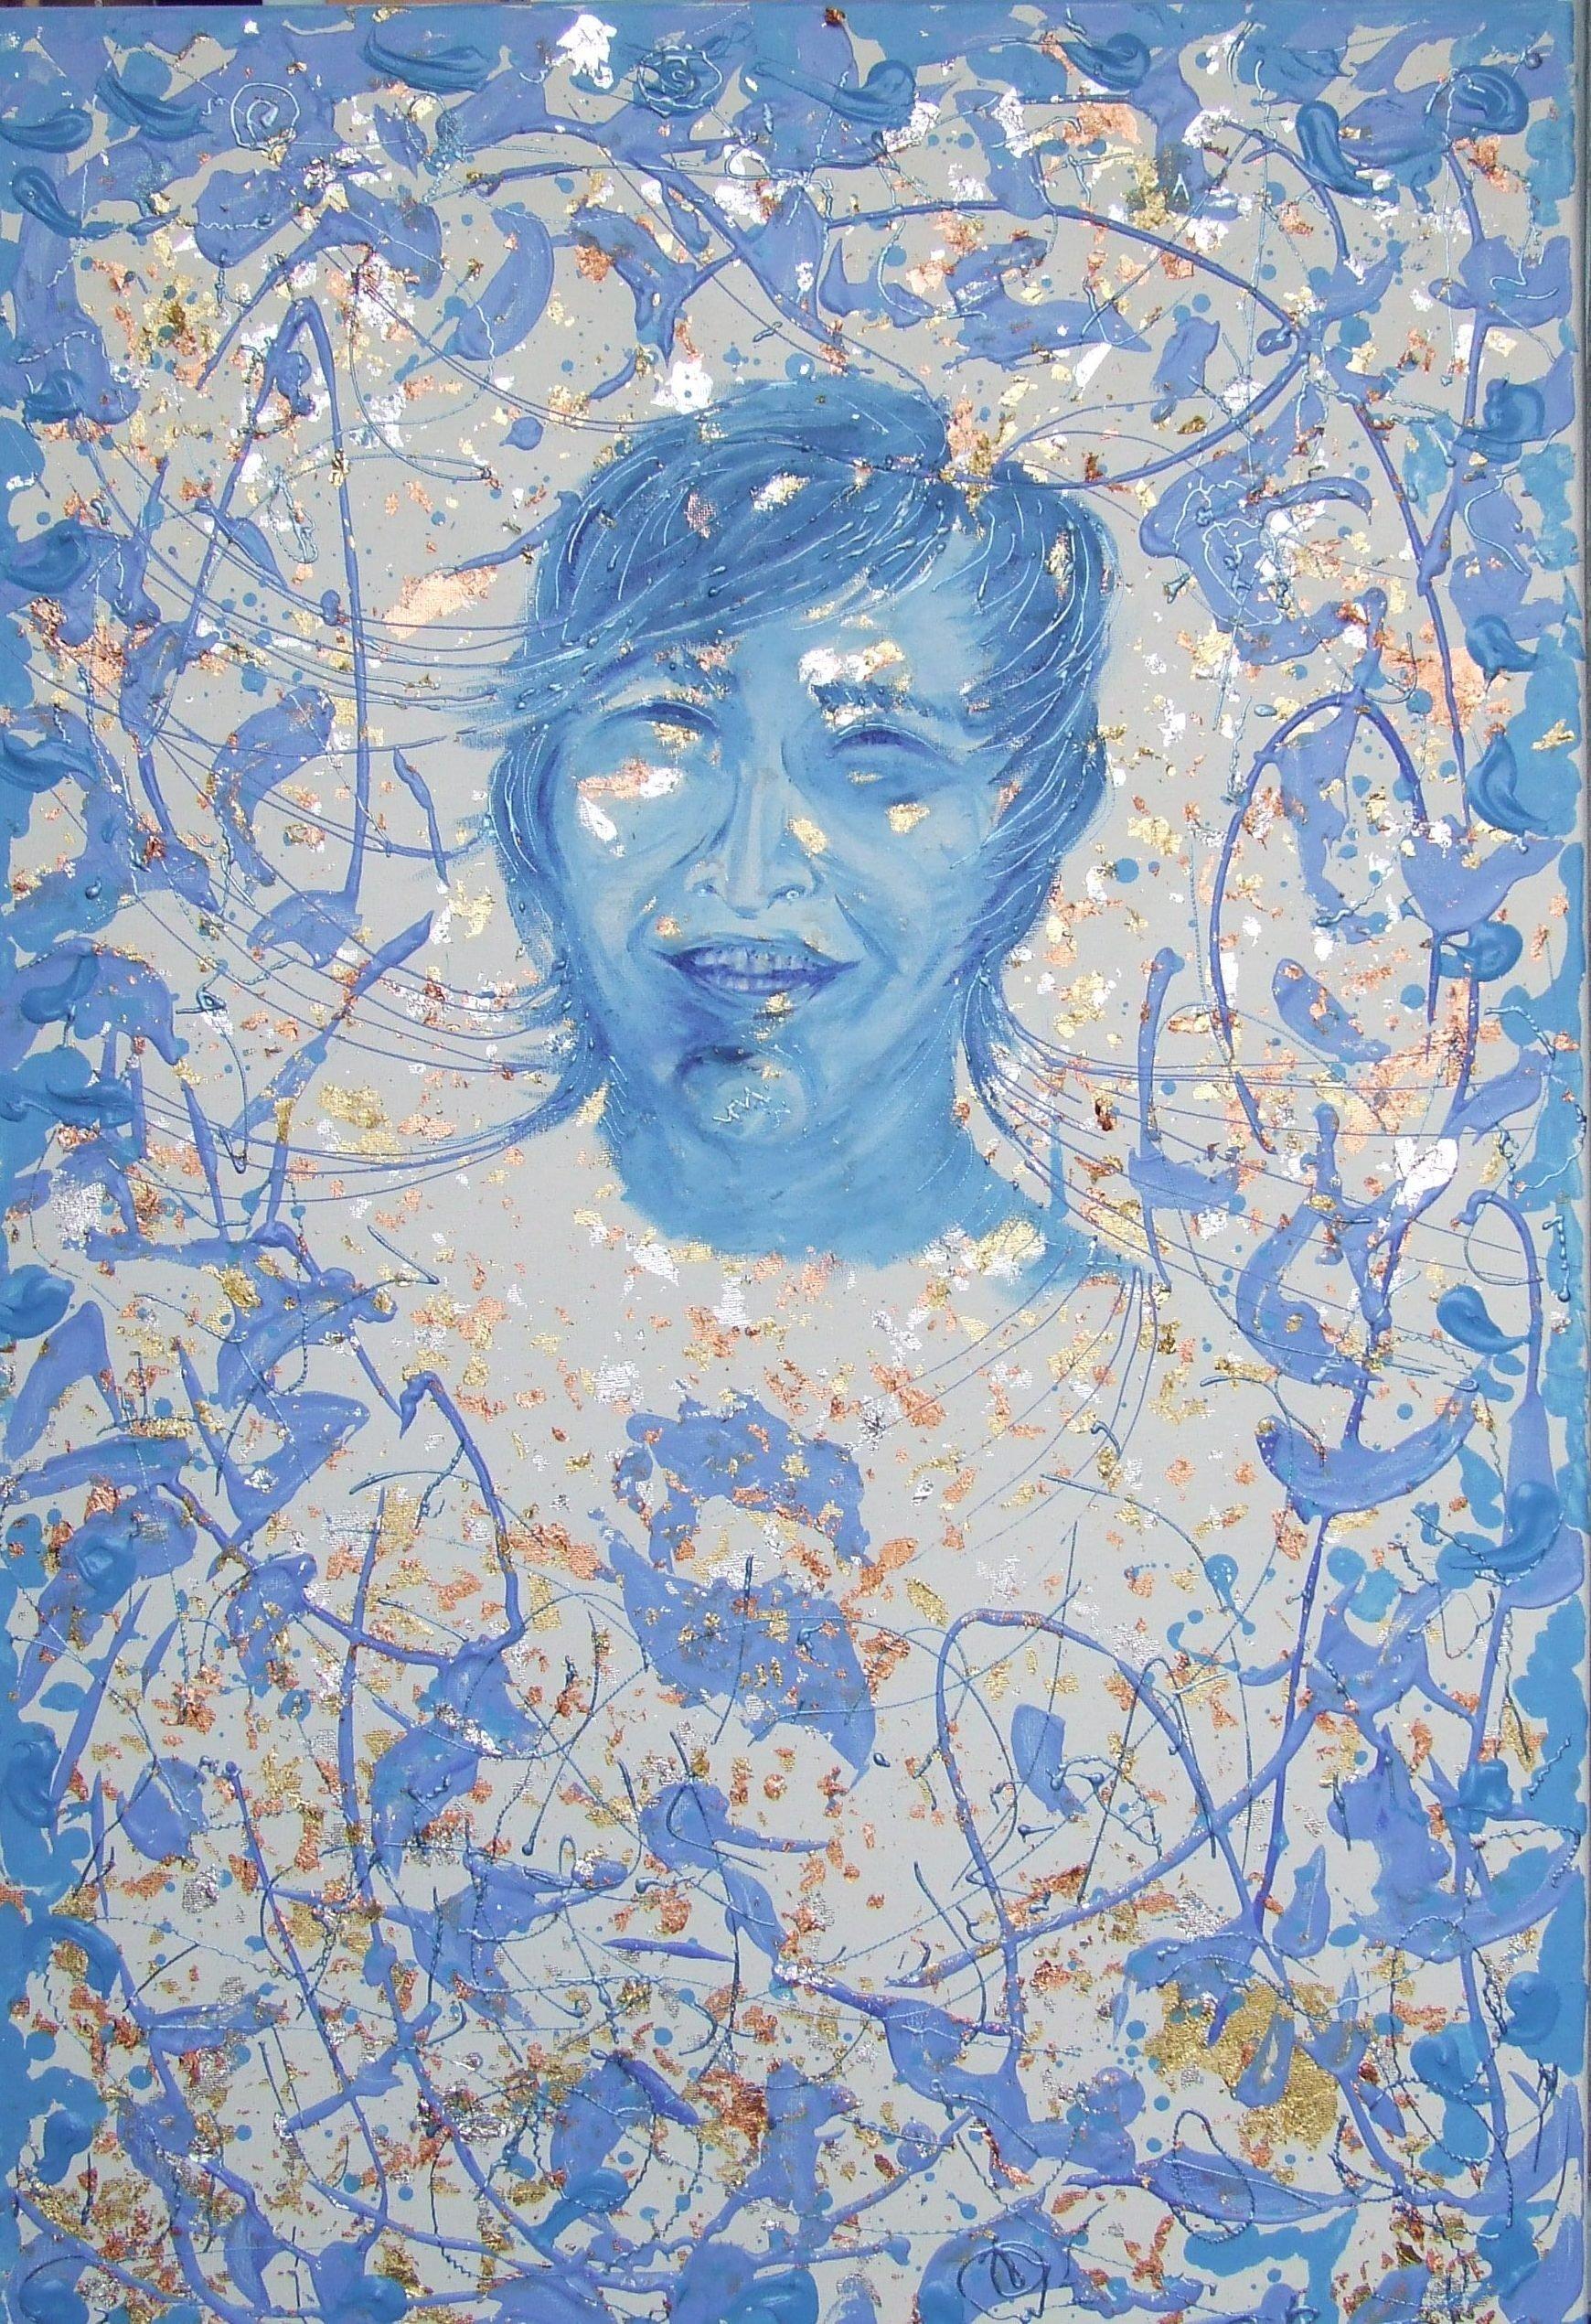 Original art Svetlana Vinokurtsev (artvinok) - I miss your happiness - acrylic on canvas - 90x60 contemporary painting